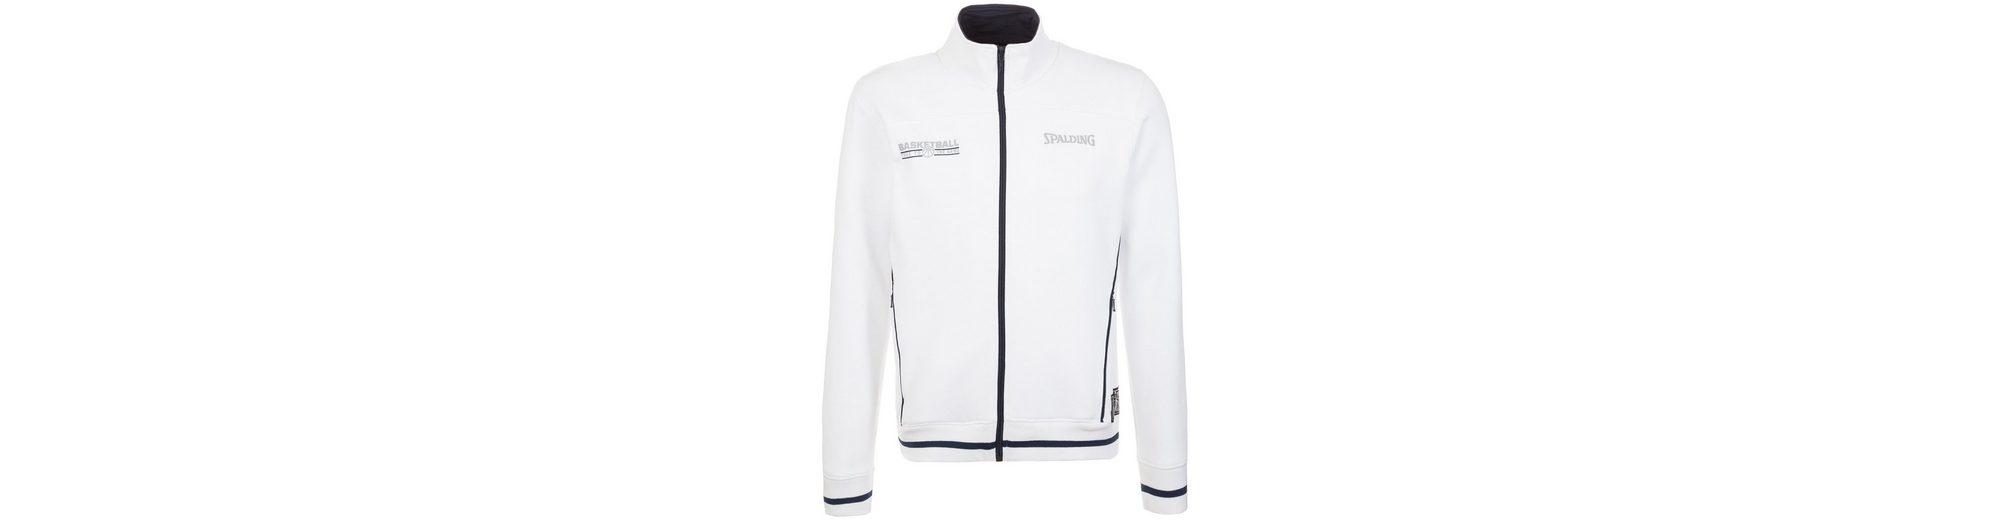 SPALDING Team Zipper Trainingsjacke Herren Auslass-Angebote WX7rGJdhw